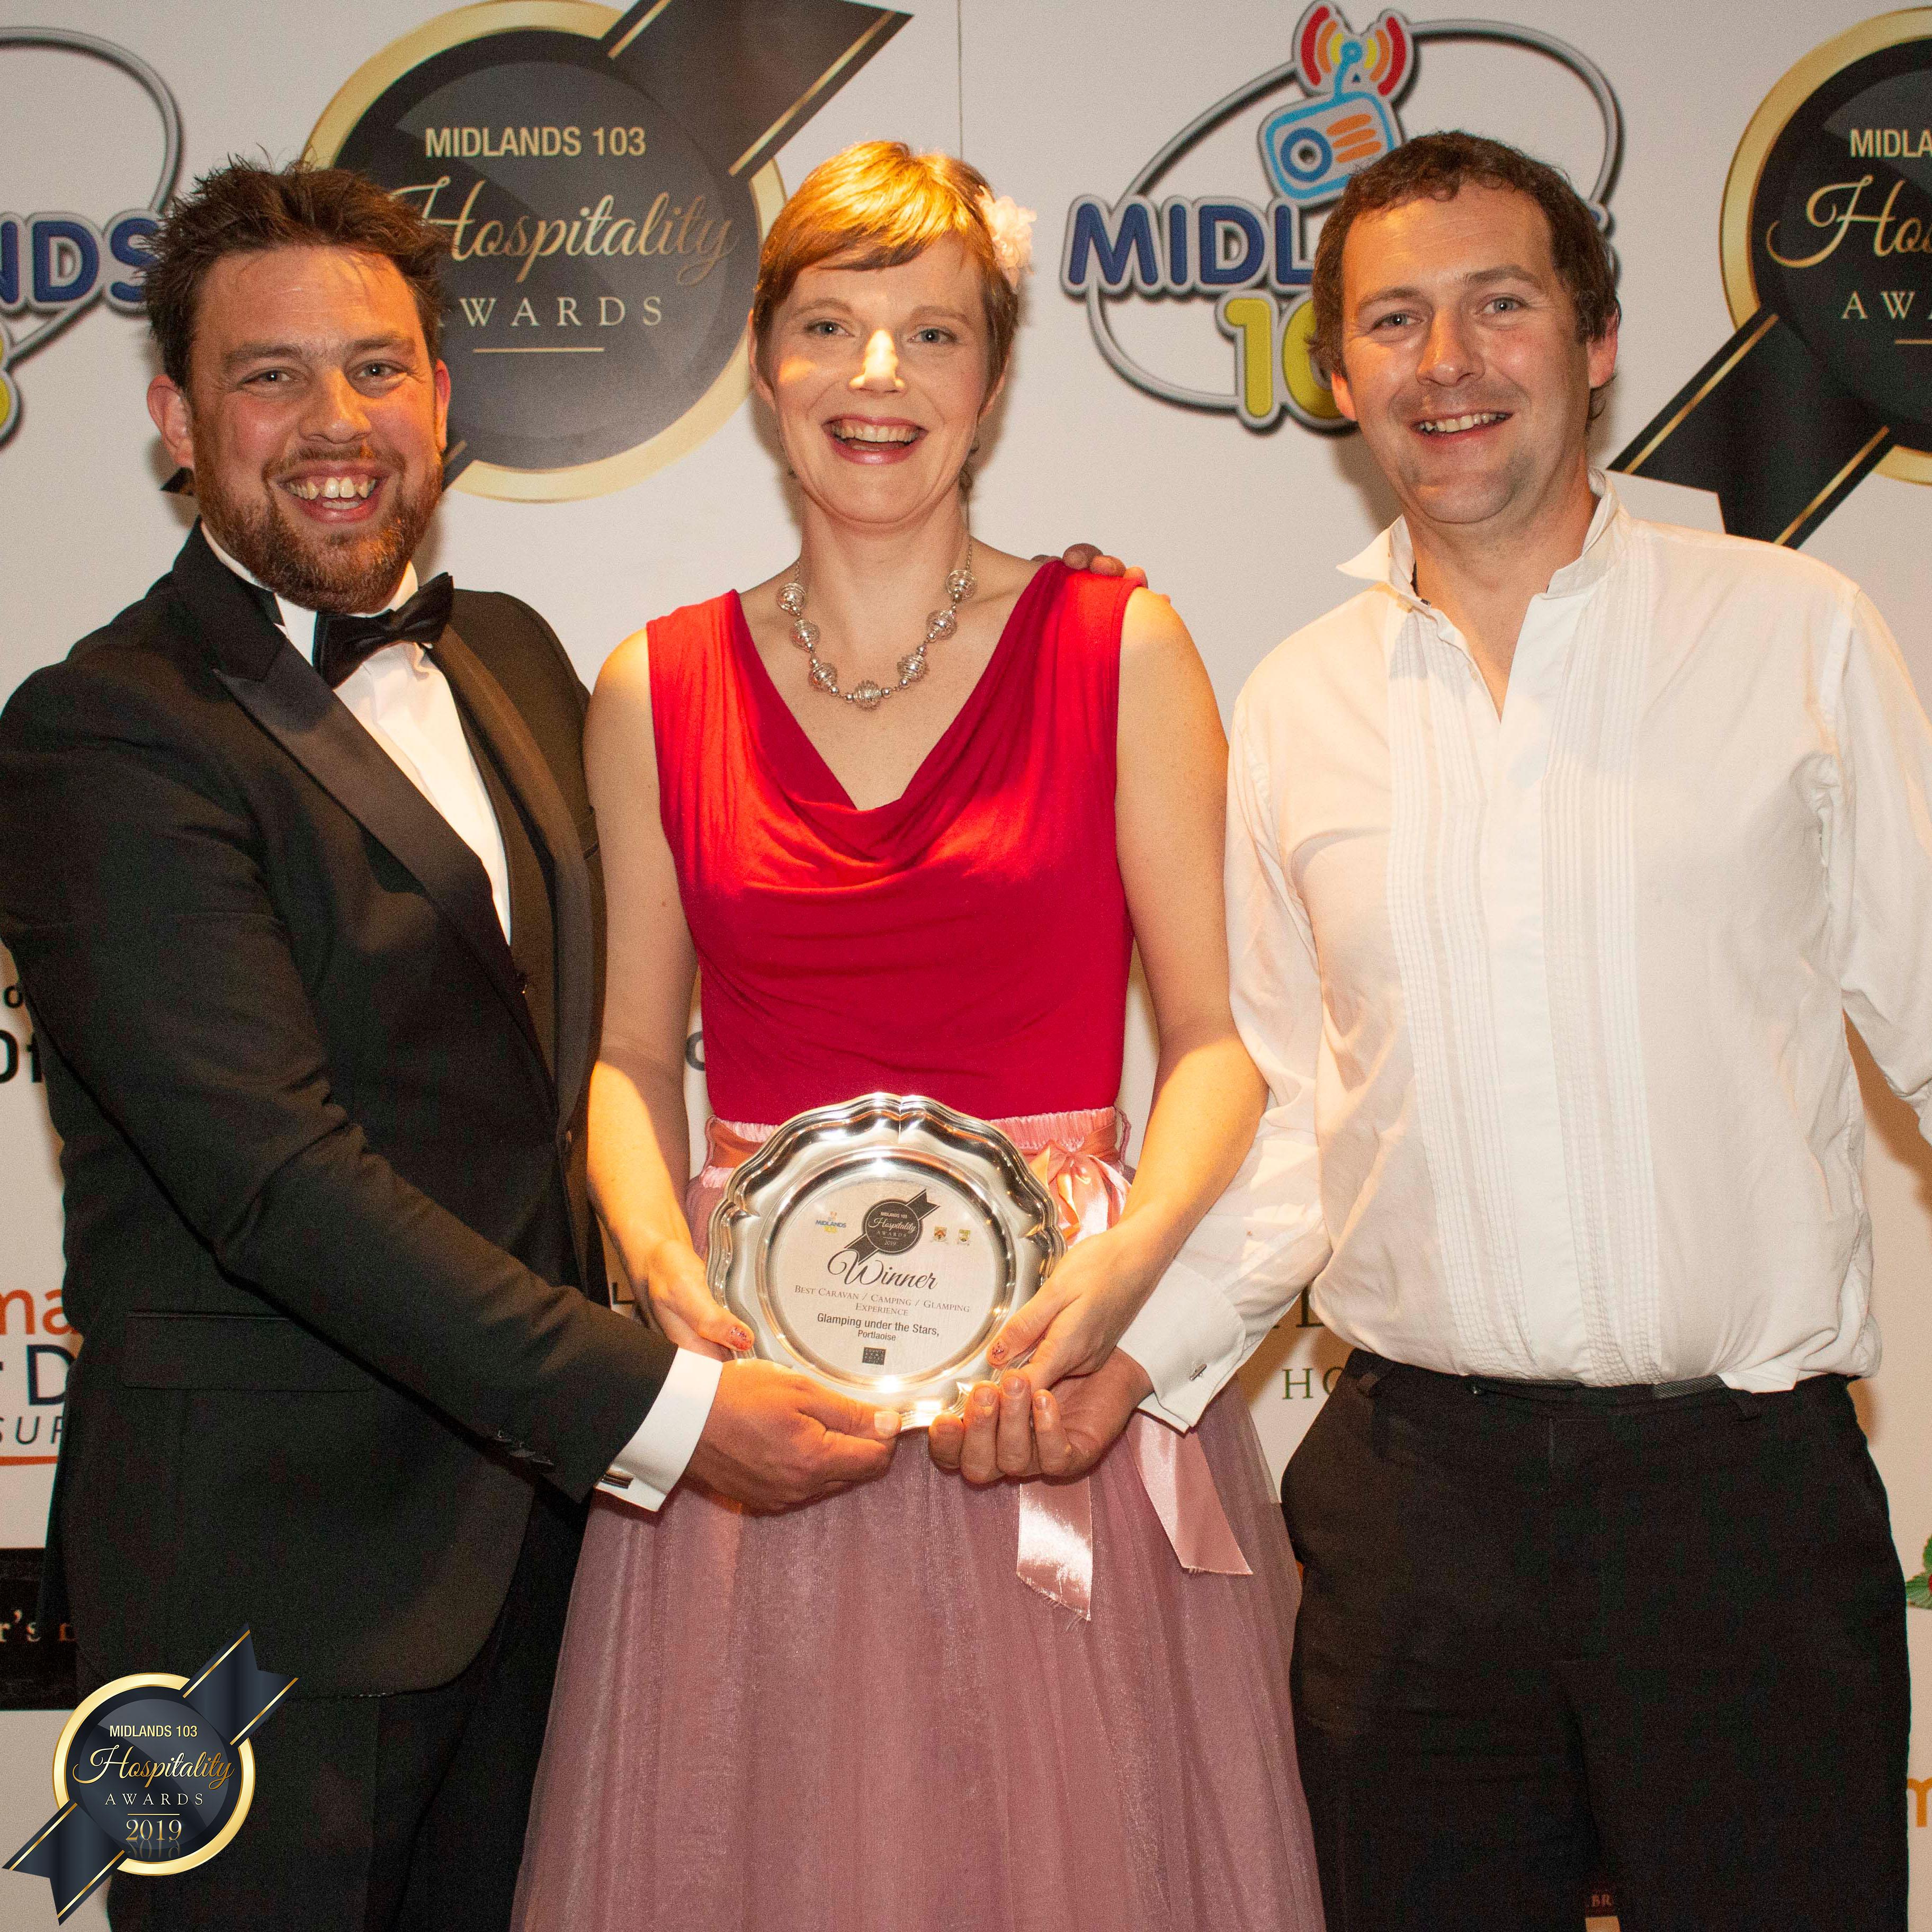 Glamping Under the Stars Wins Hospitality Award!